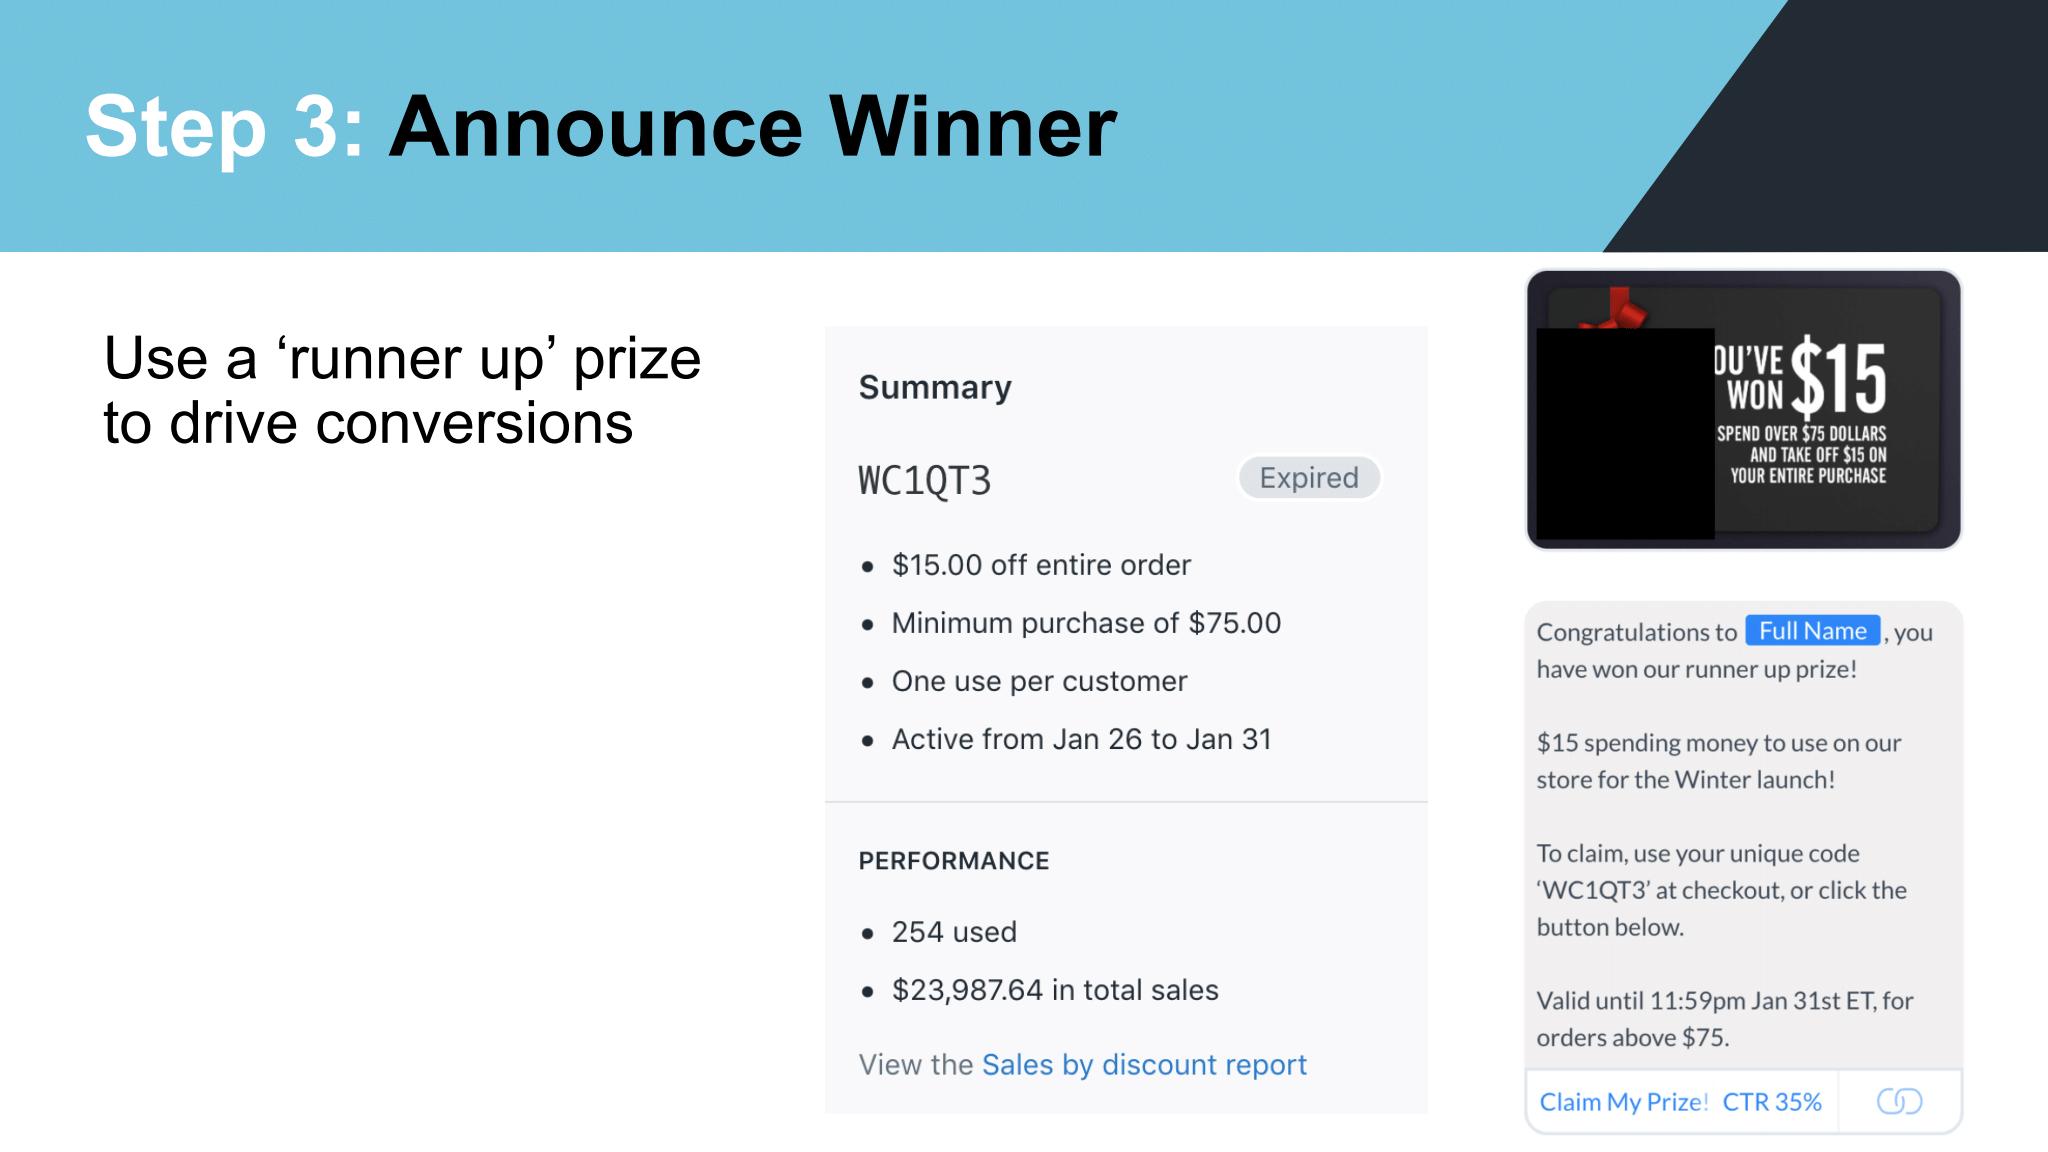 Dimitri Nikolakakis – Announce Winner